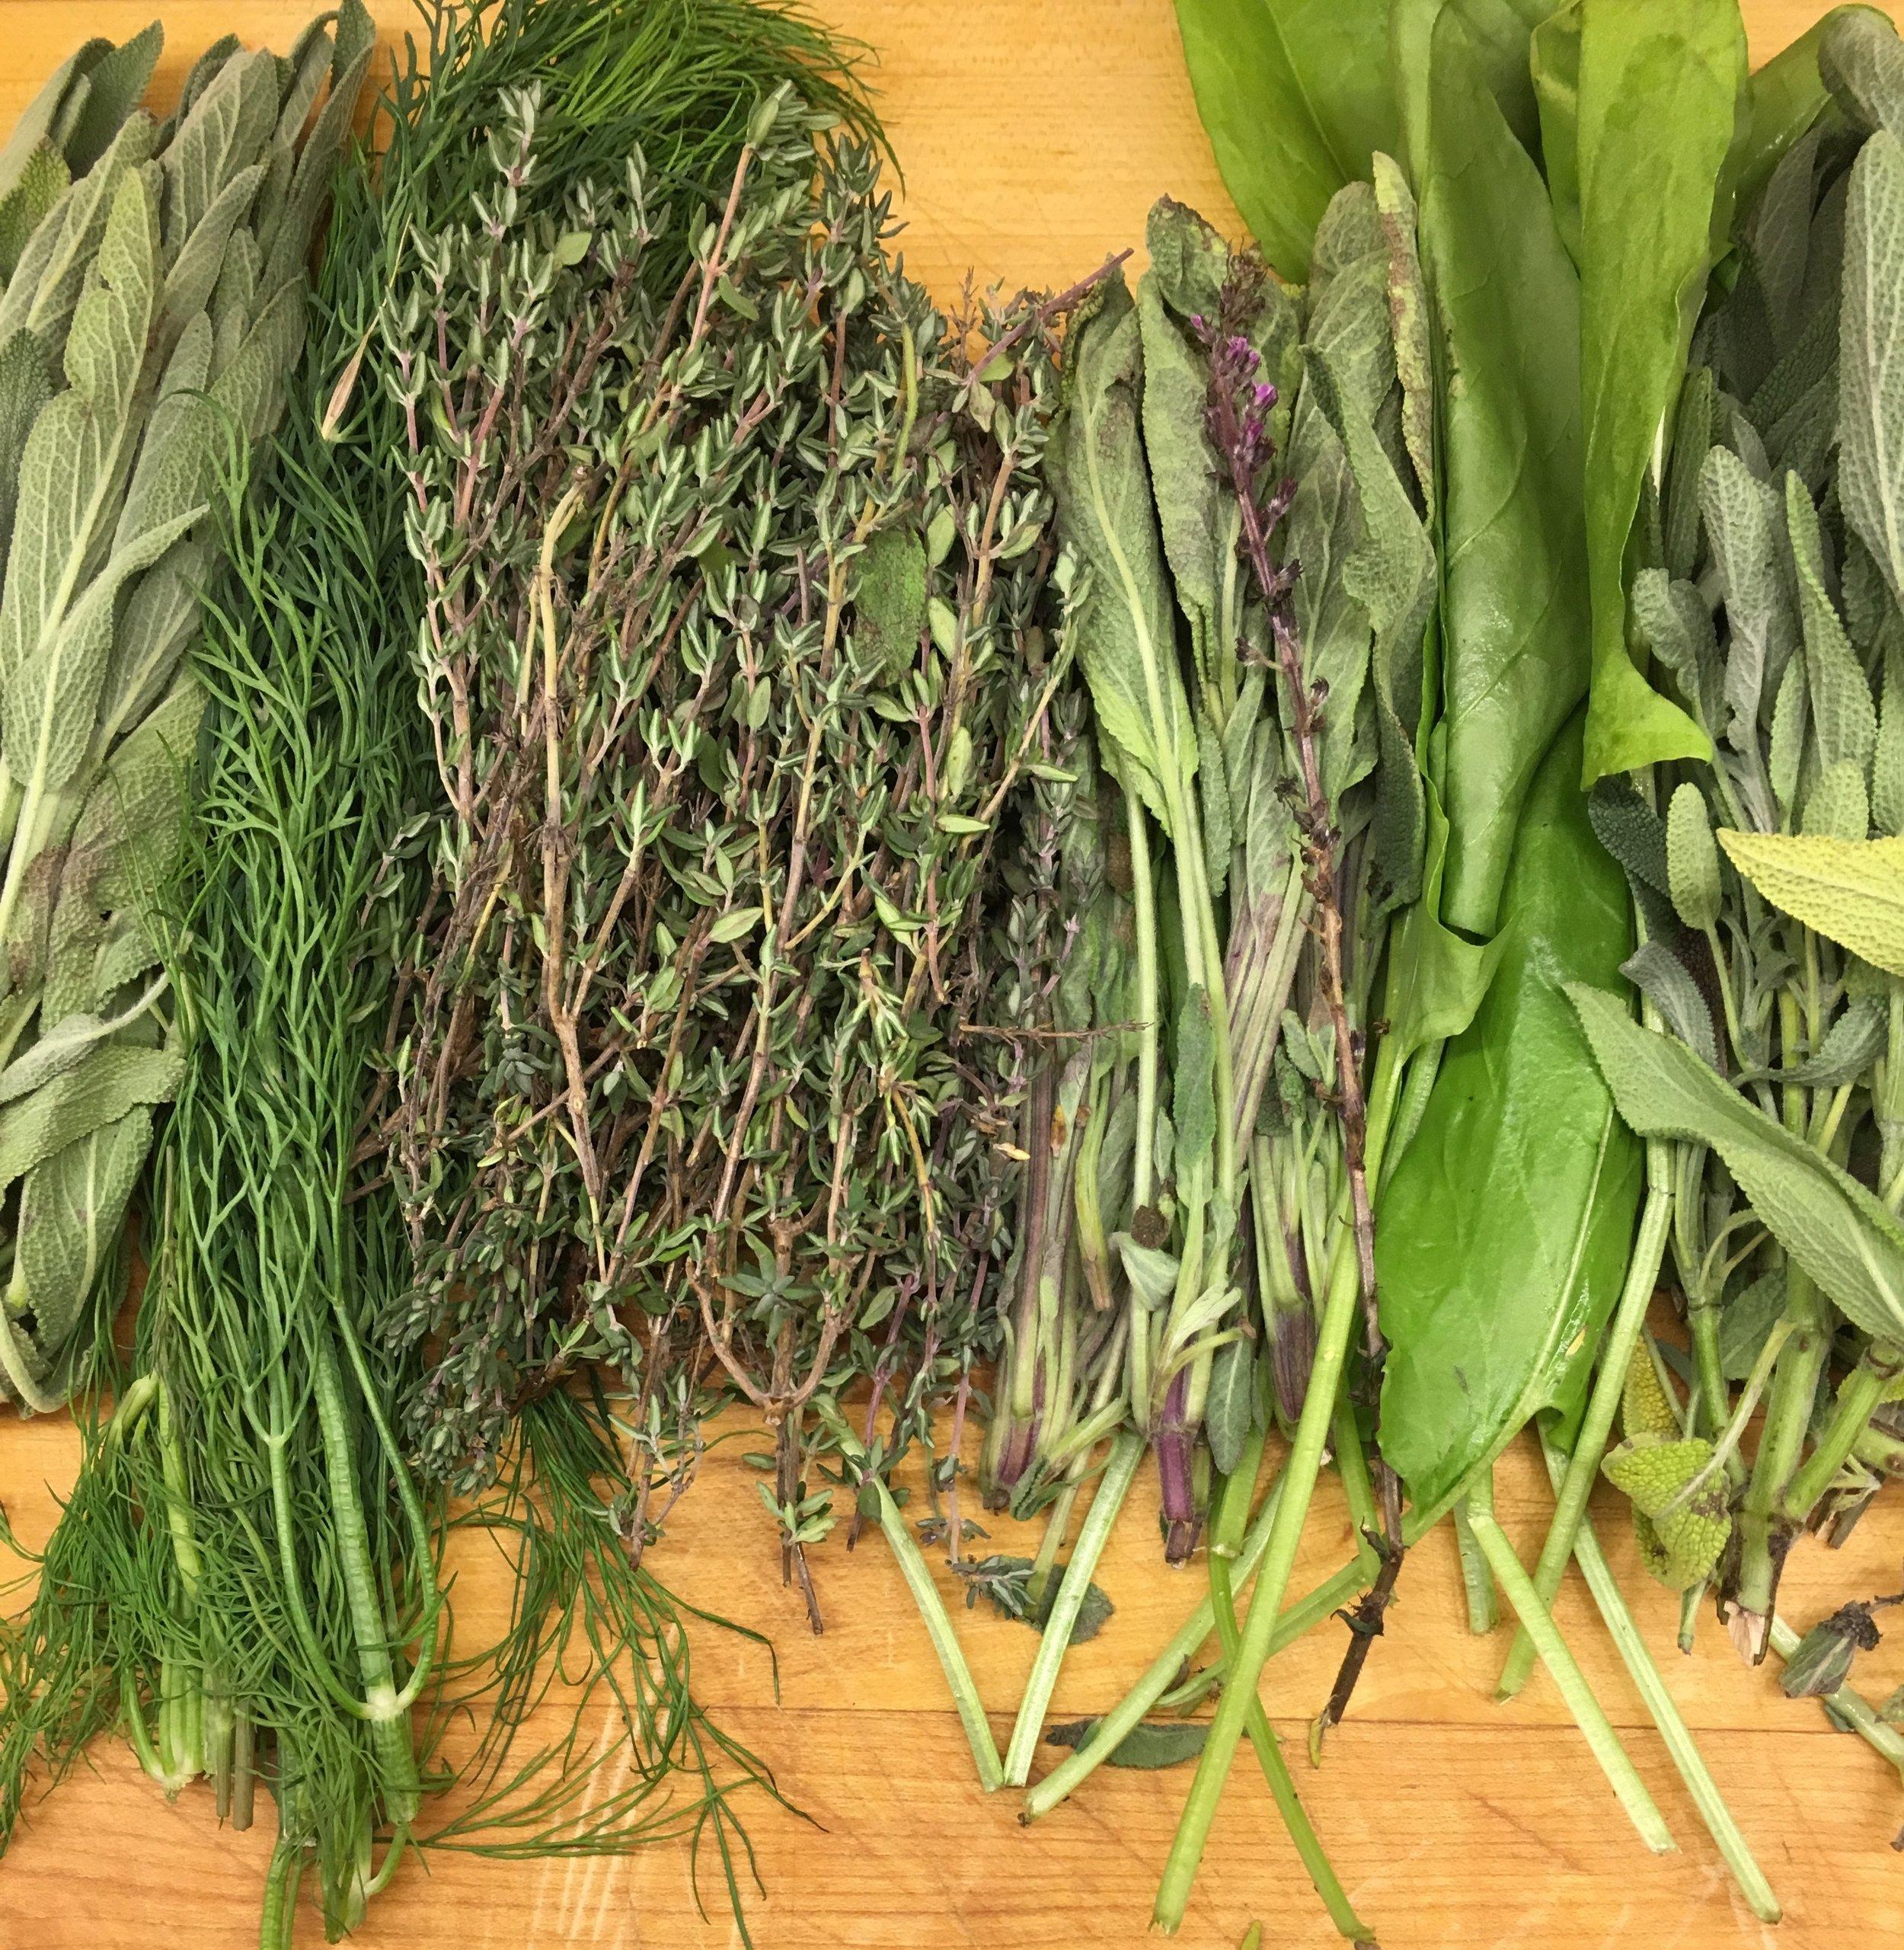 Fresh herbs on butcher block McCall Idaho personal chef